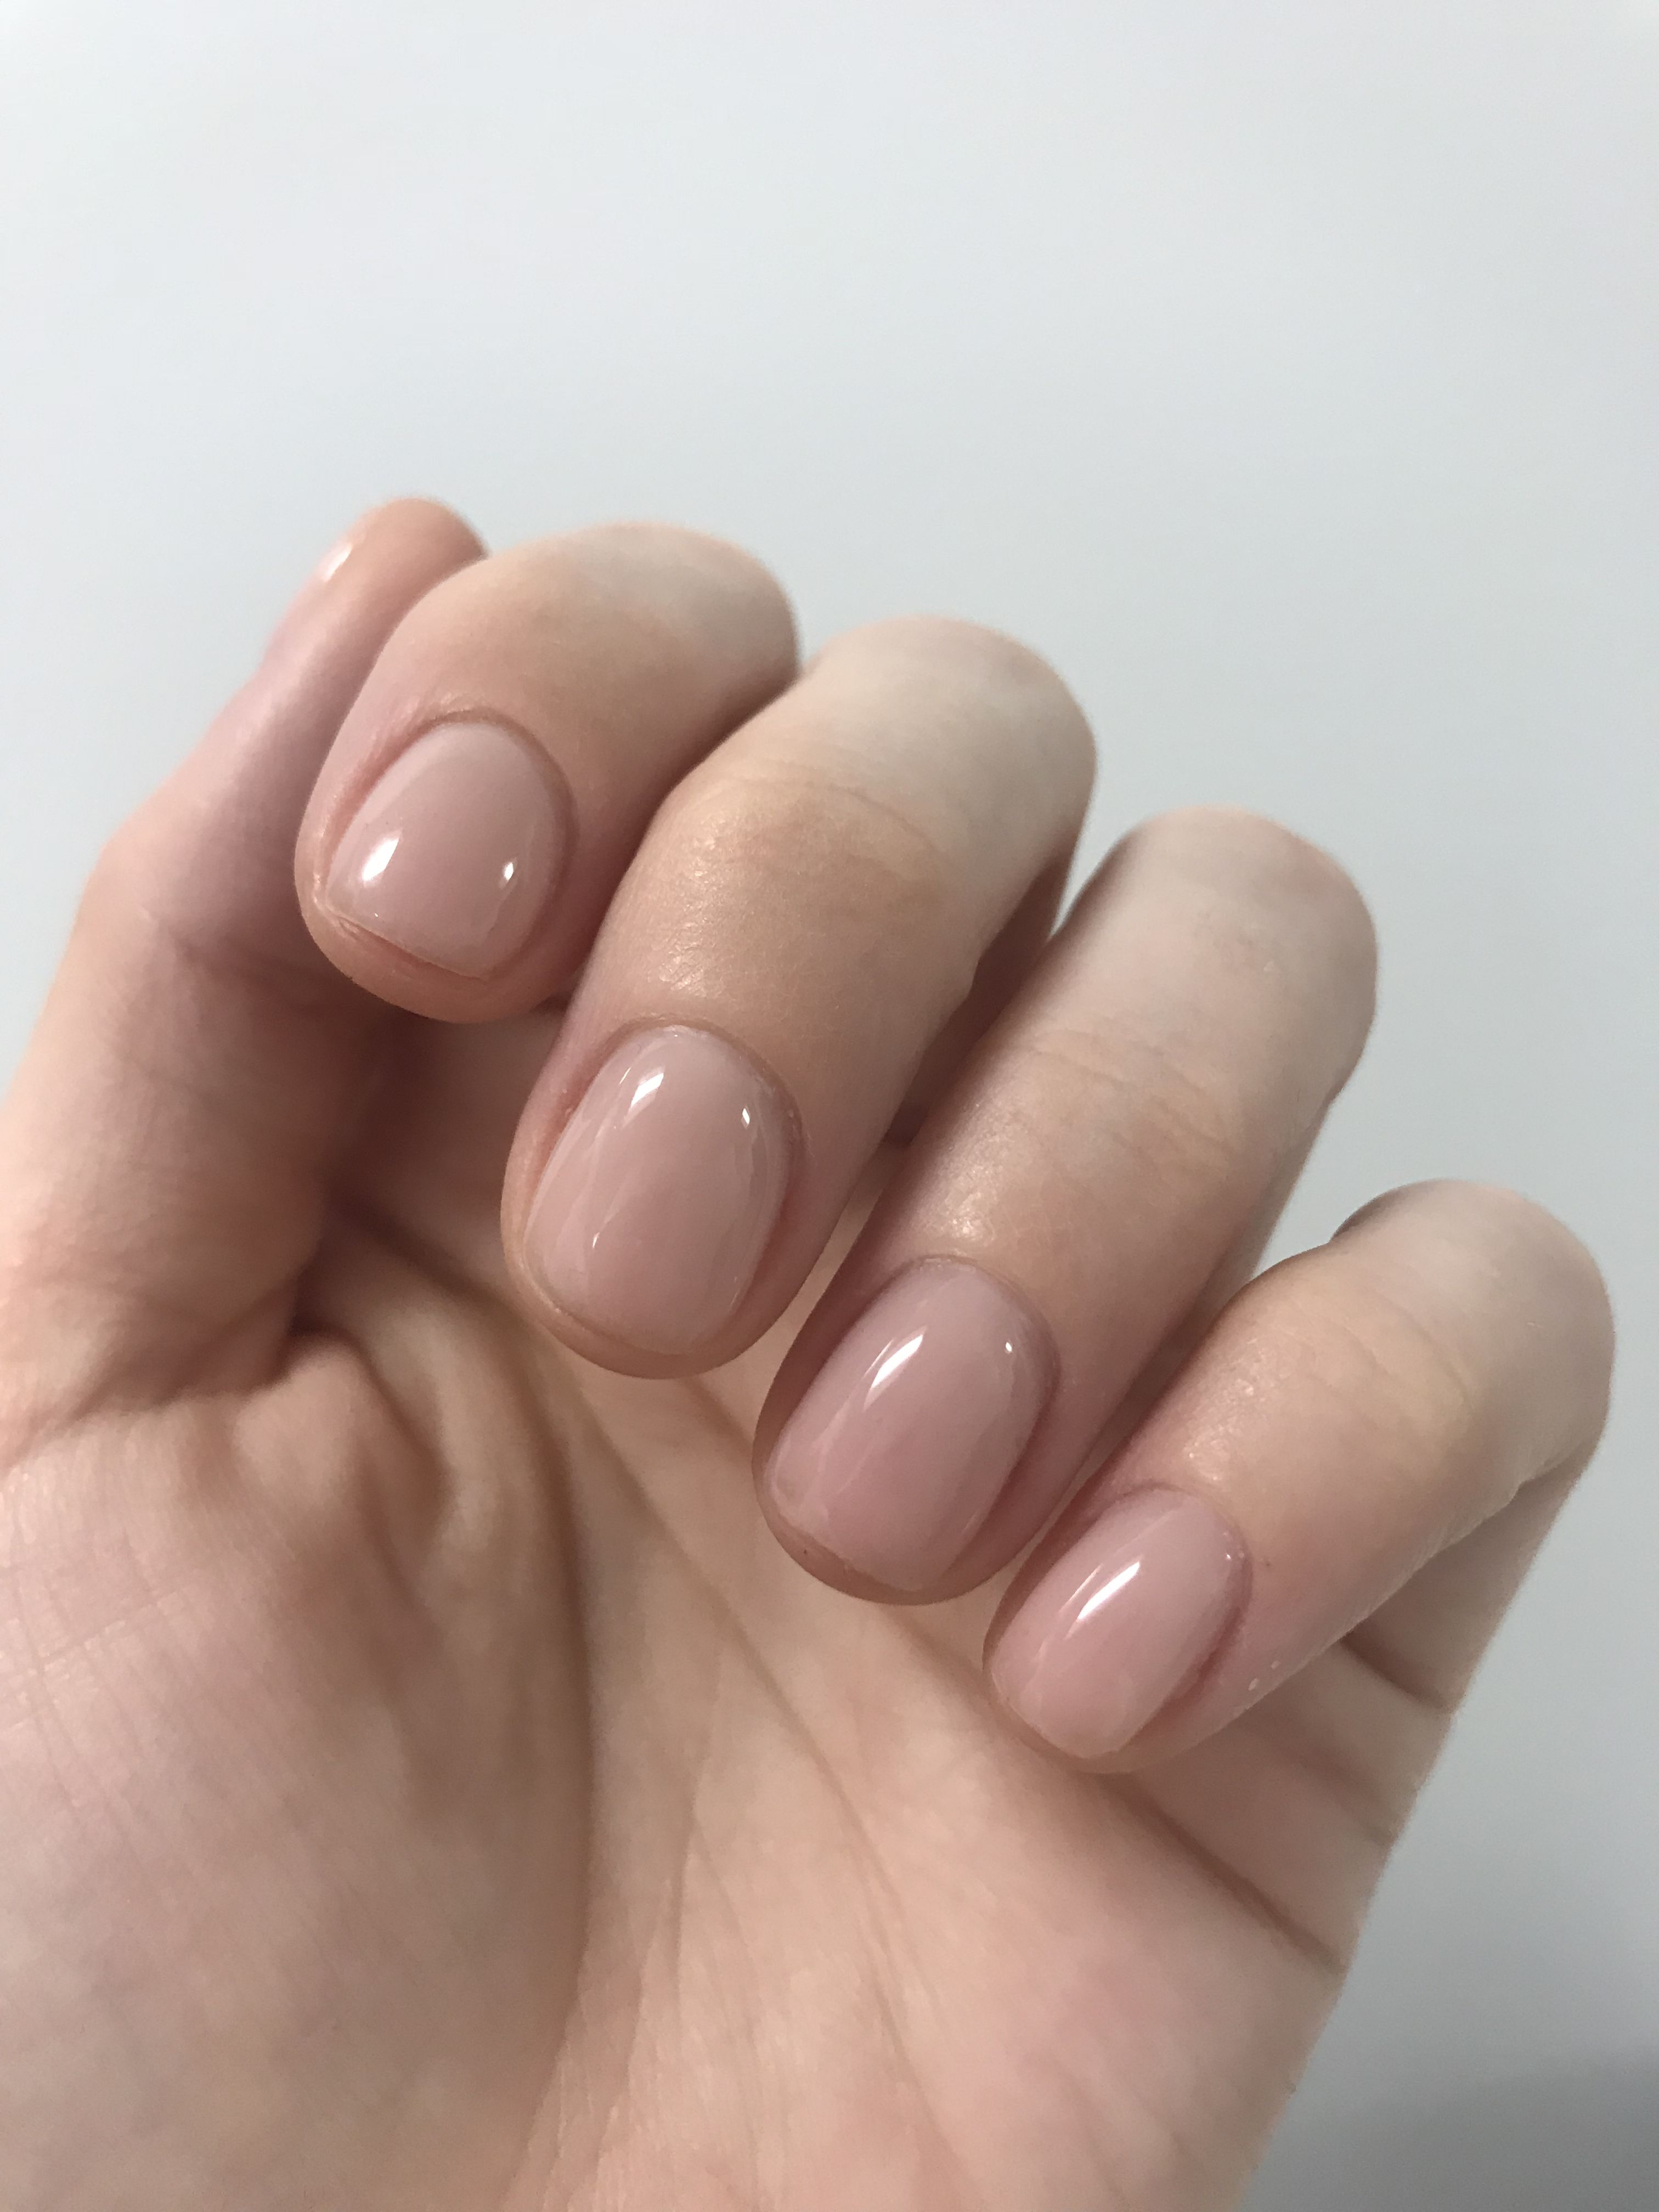 Opi Put It In Neutral Neutral Nails Nail Polish Gel Nails